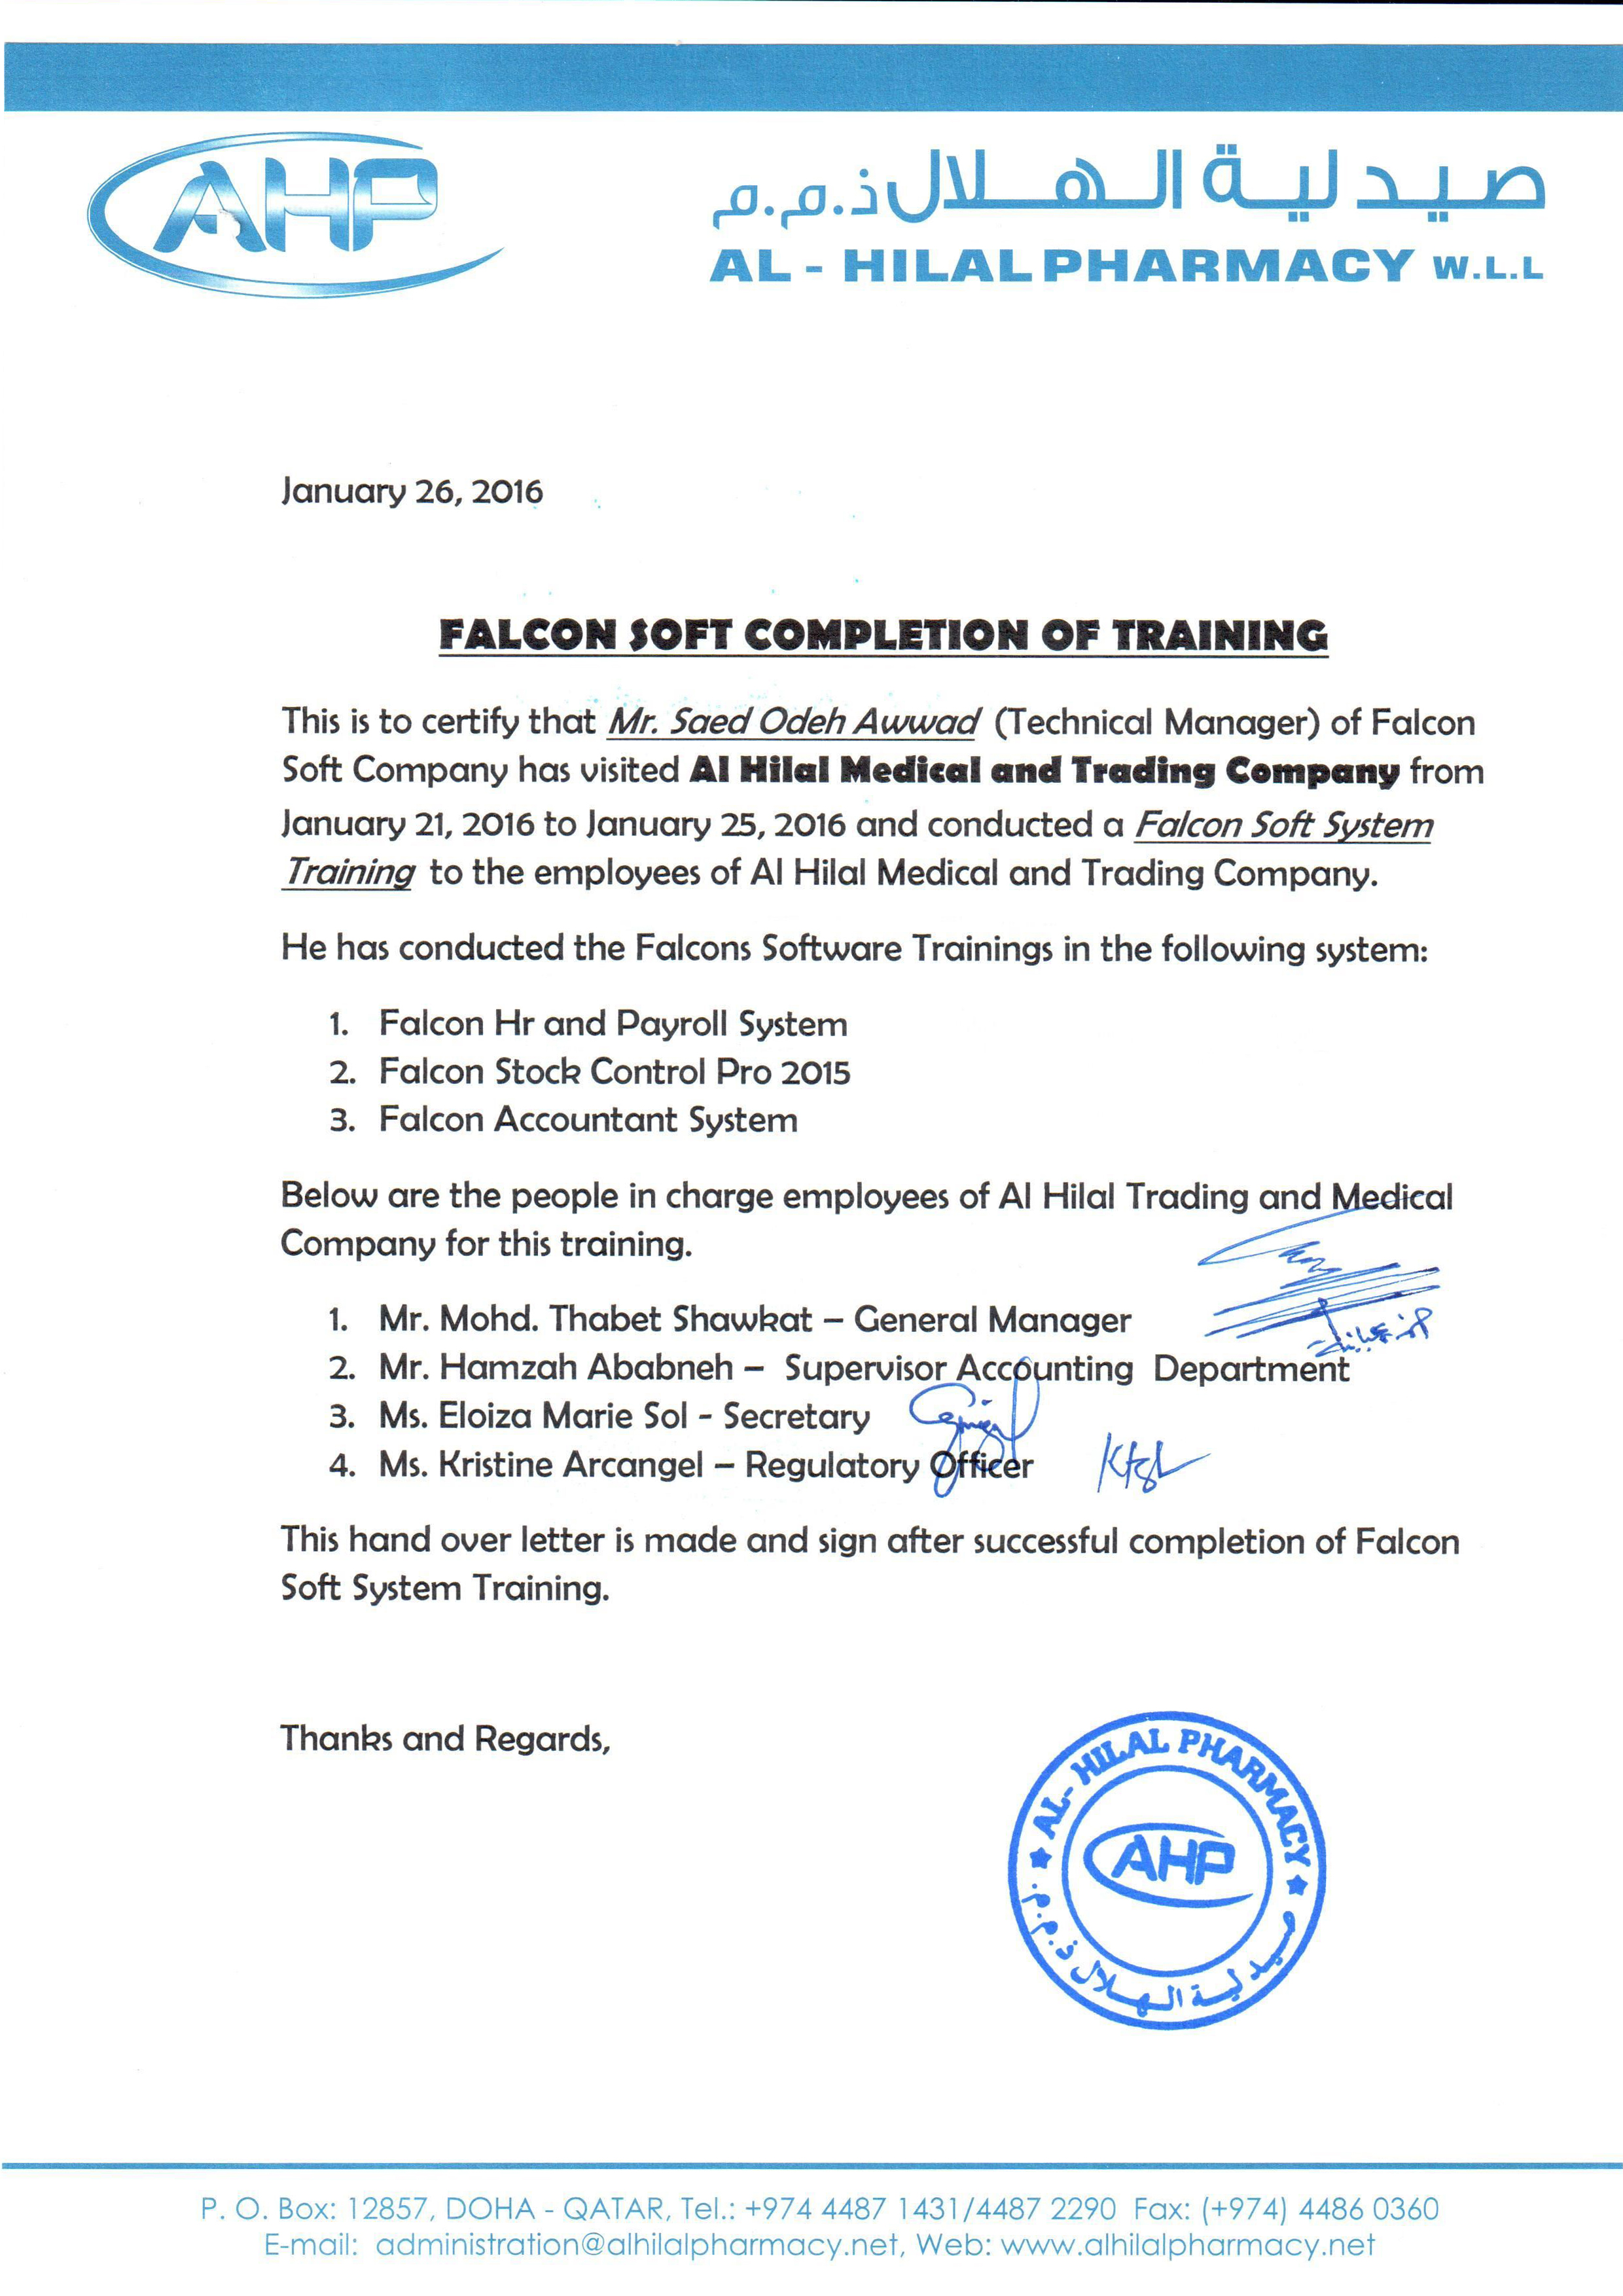 Falcons soft has awarded four new certifications in qatar falcons soft has awarded four new certifications in qatar 1betcityfo Image collections